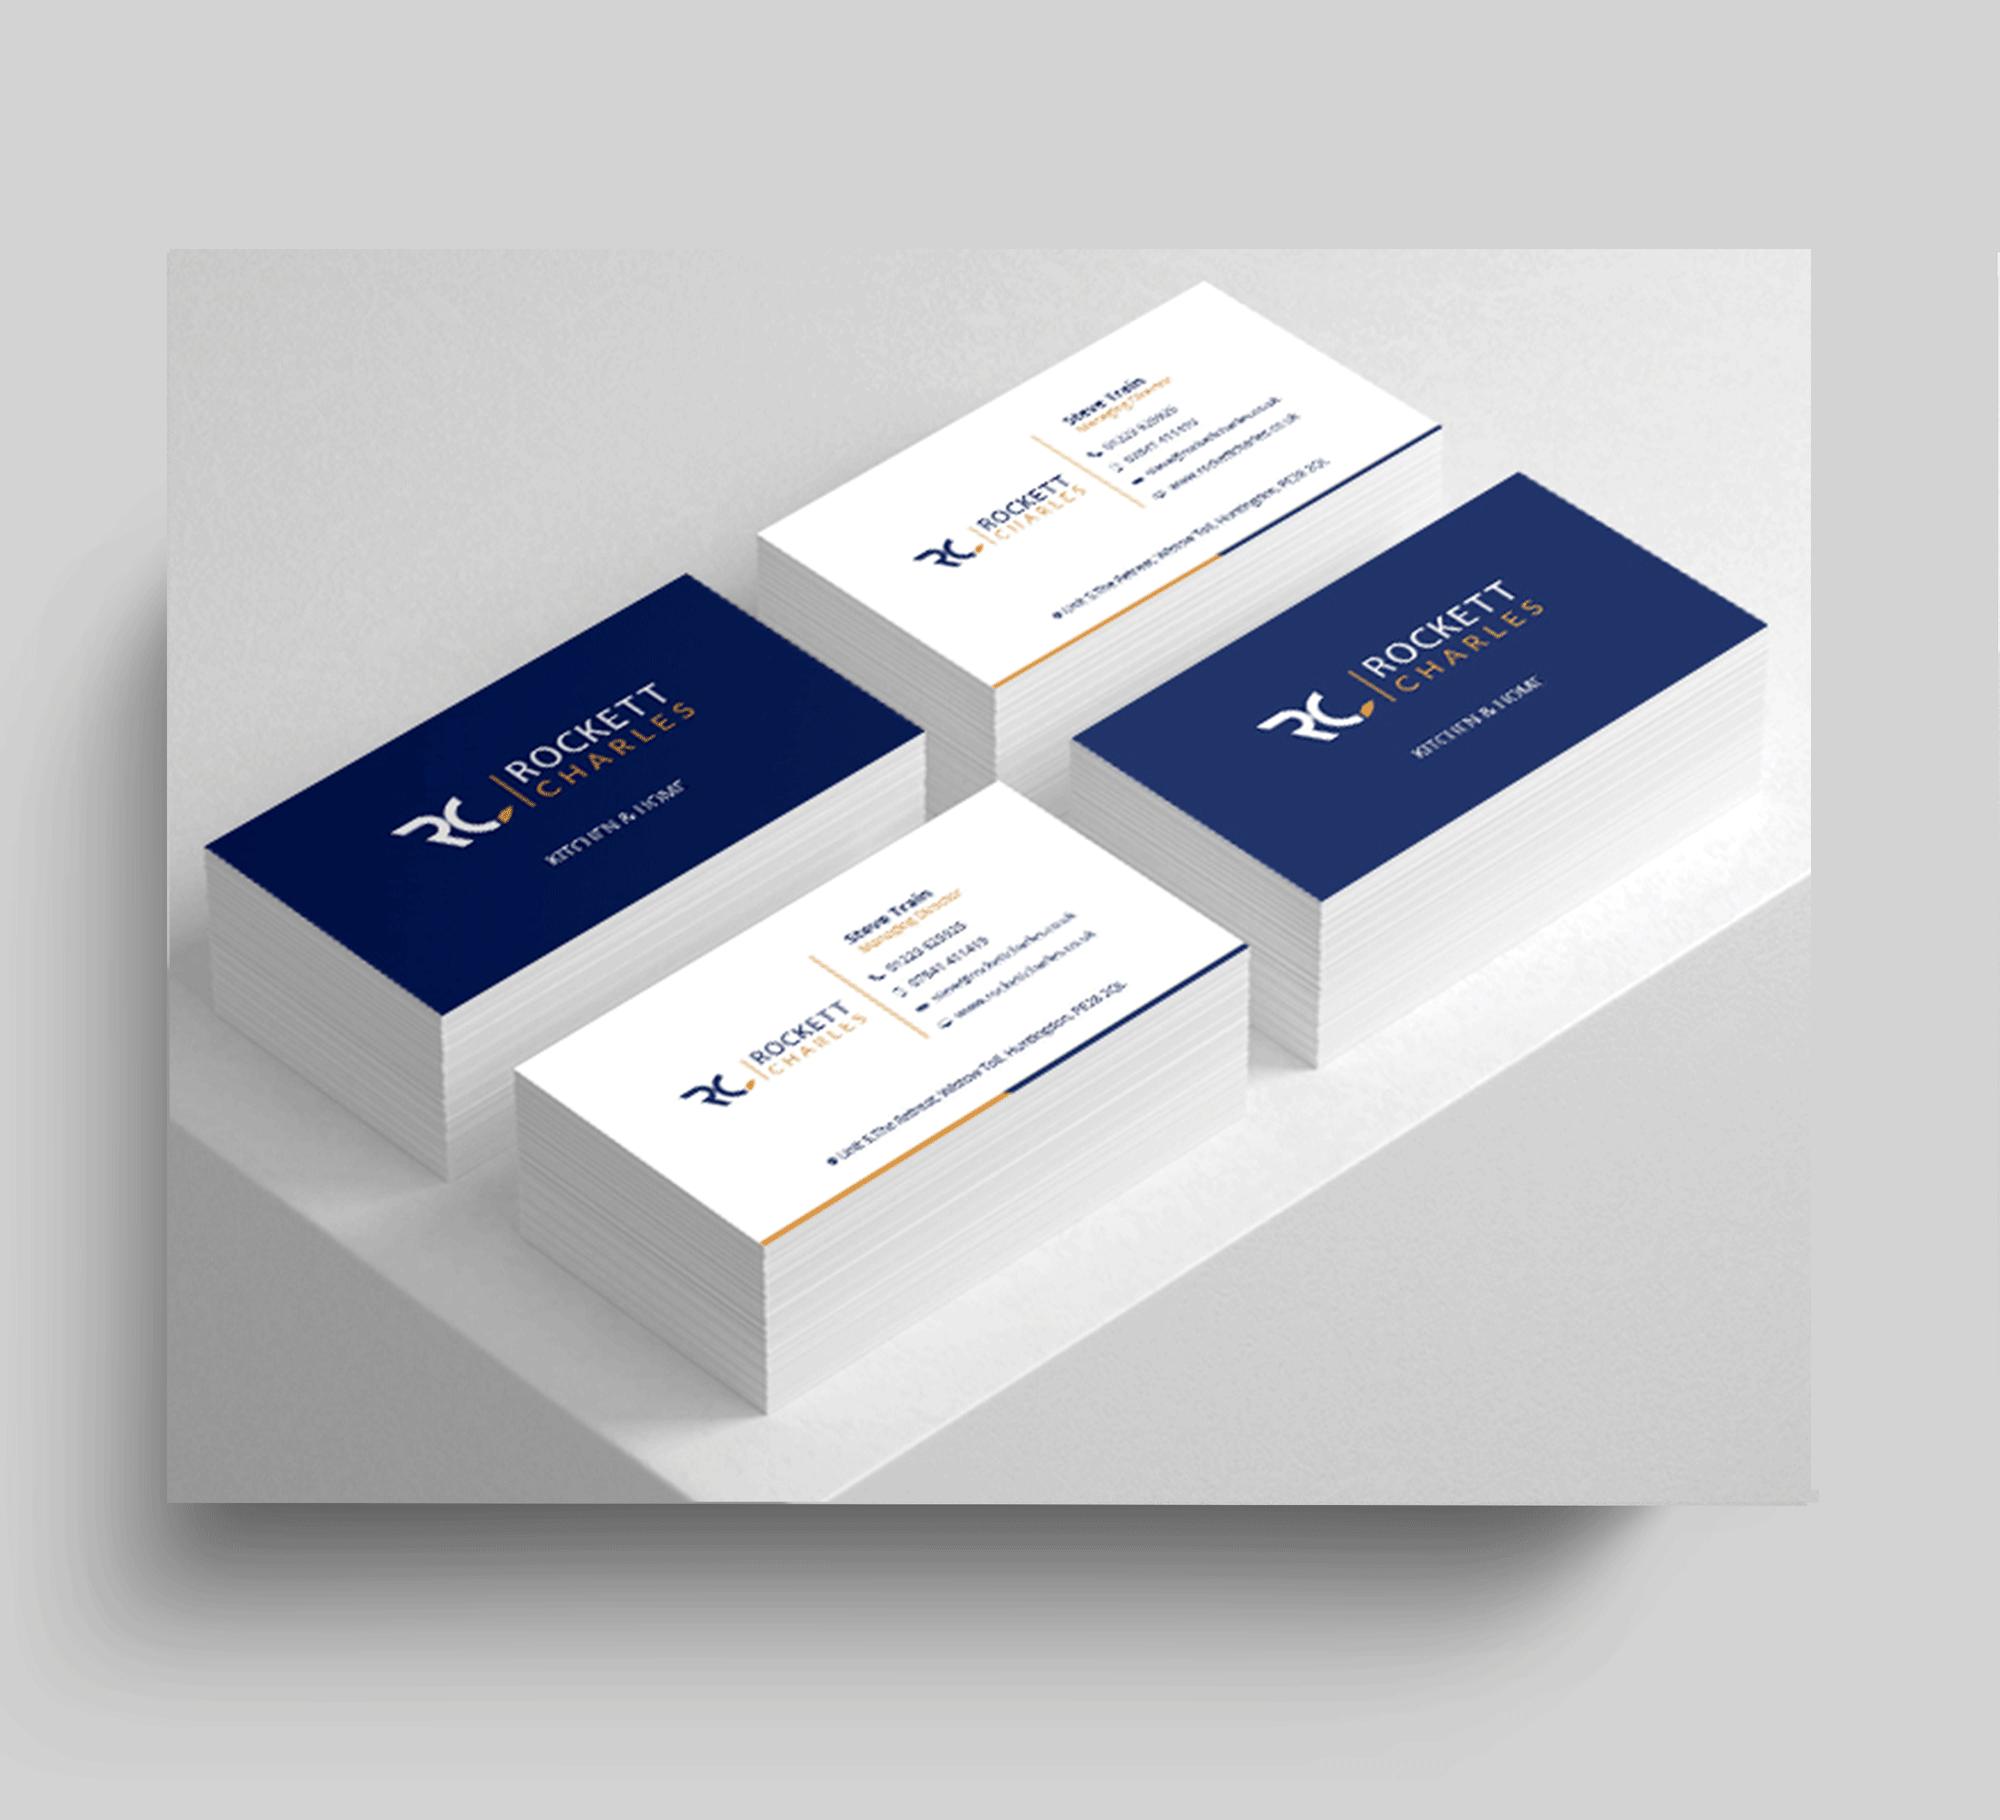 rockett_charles-business-cards